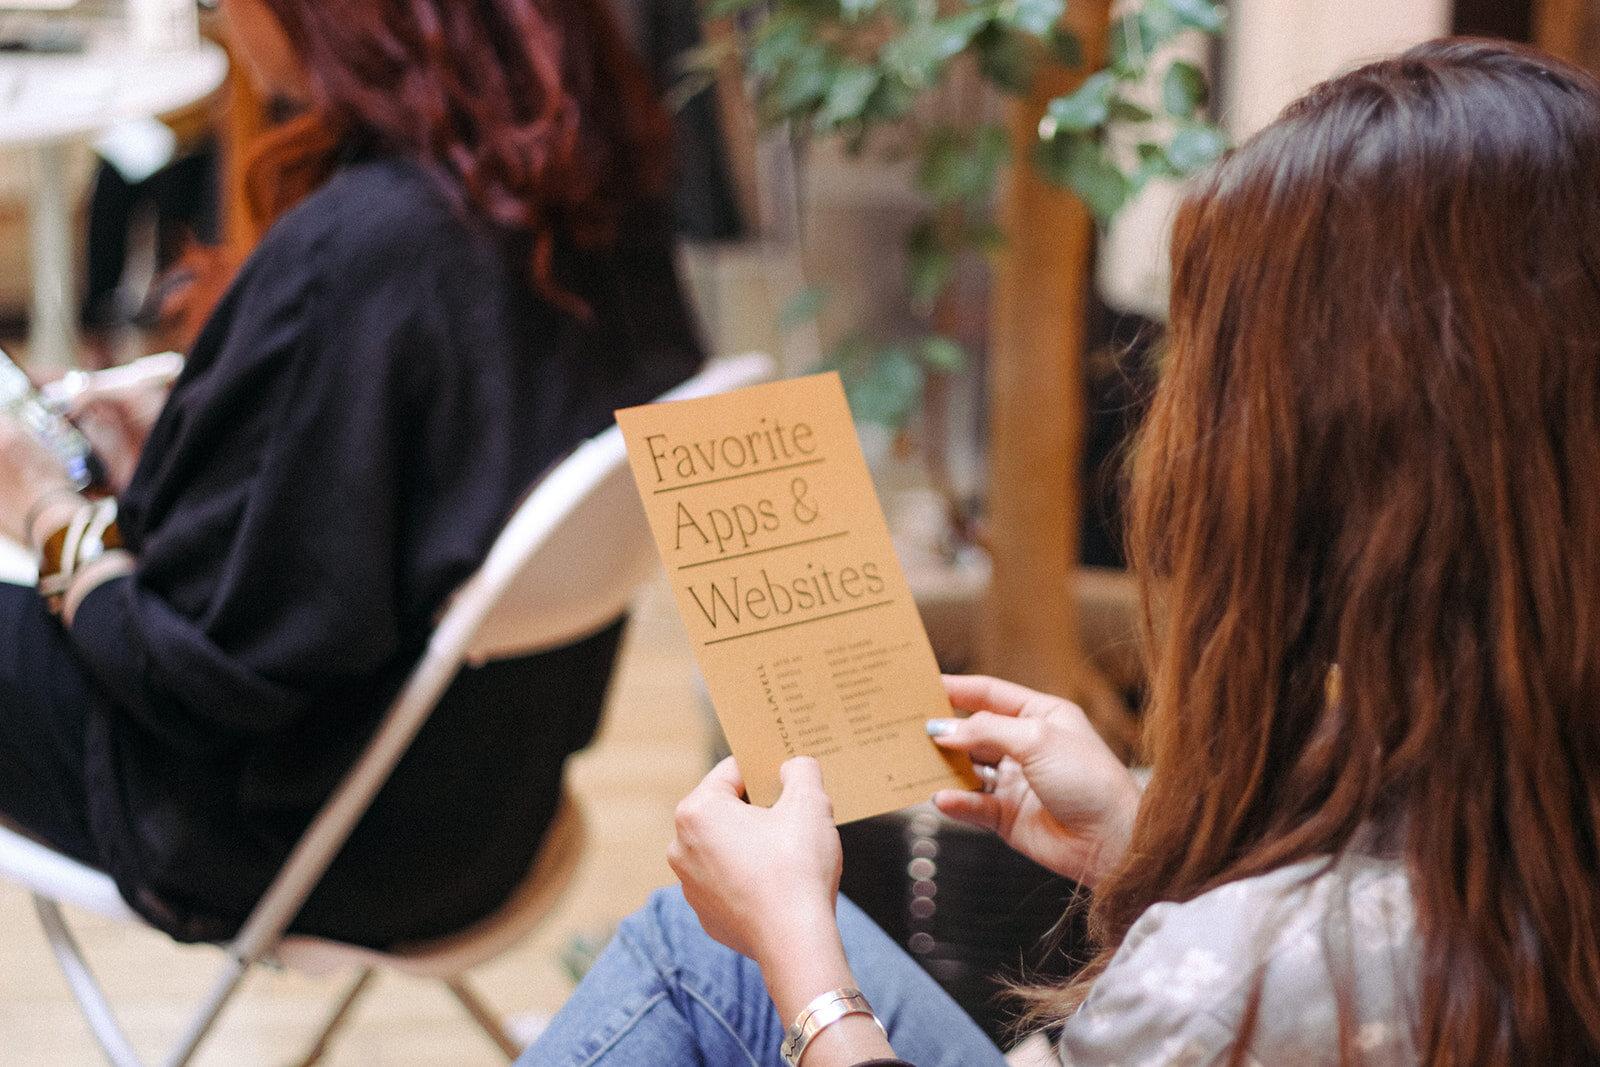 Photography-101-Workshop-Spokane-WA-Alycia-Lovell-Photography-She-Is-Vested-27.jpg